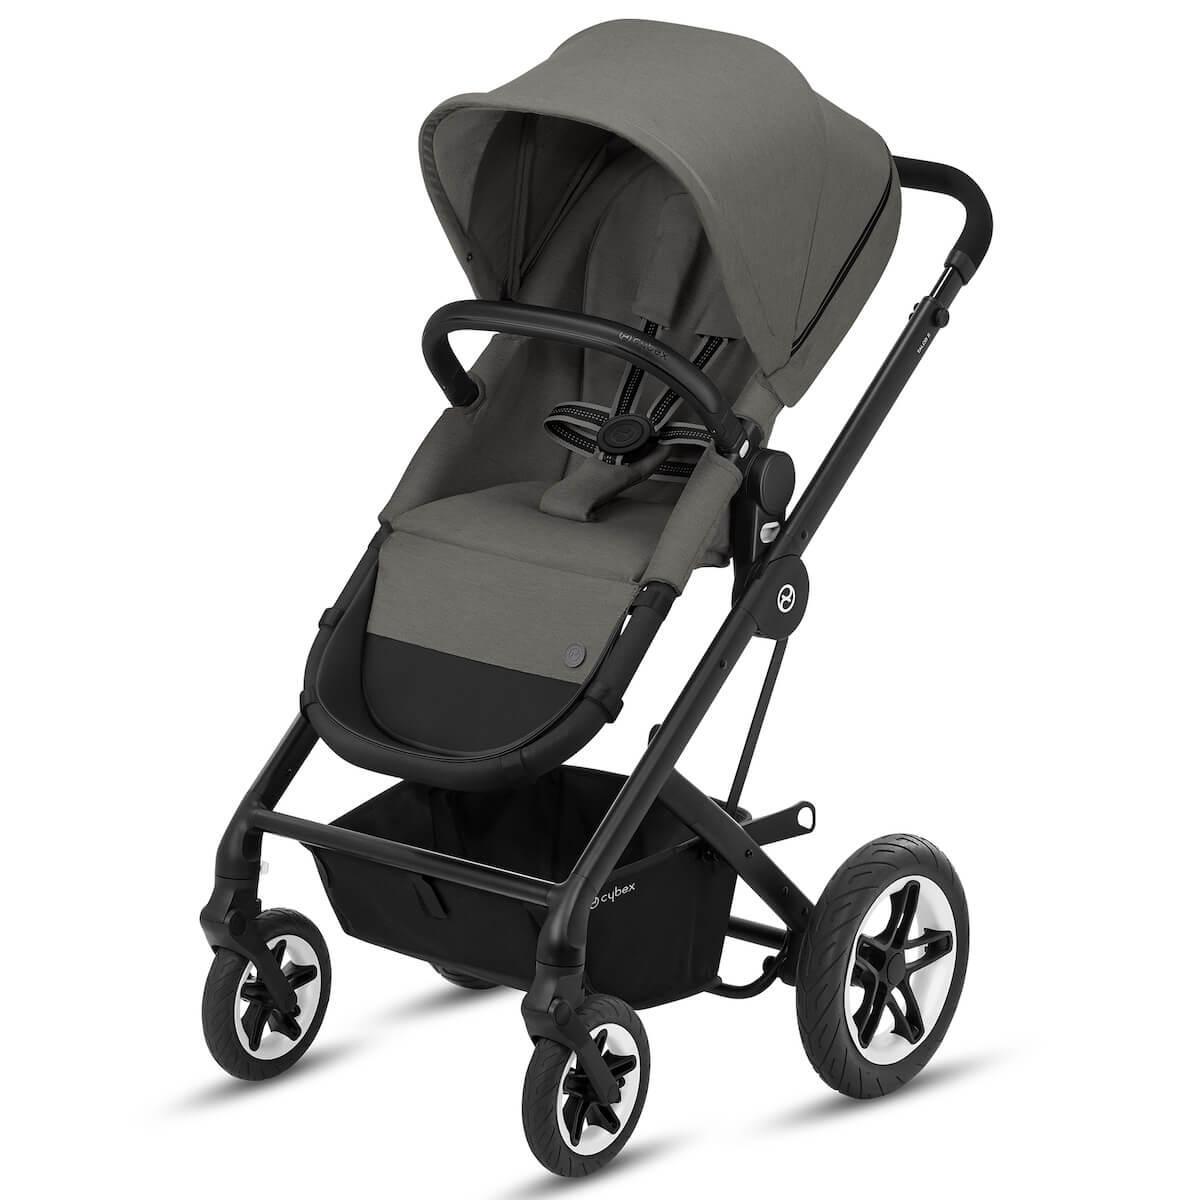 Kinderwagen TALOS S 2in1 BLK Cybex Soho grey-mid grey